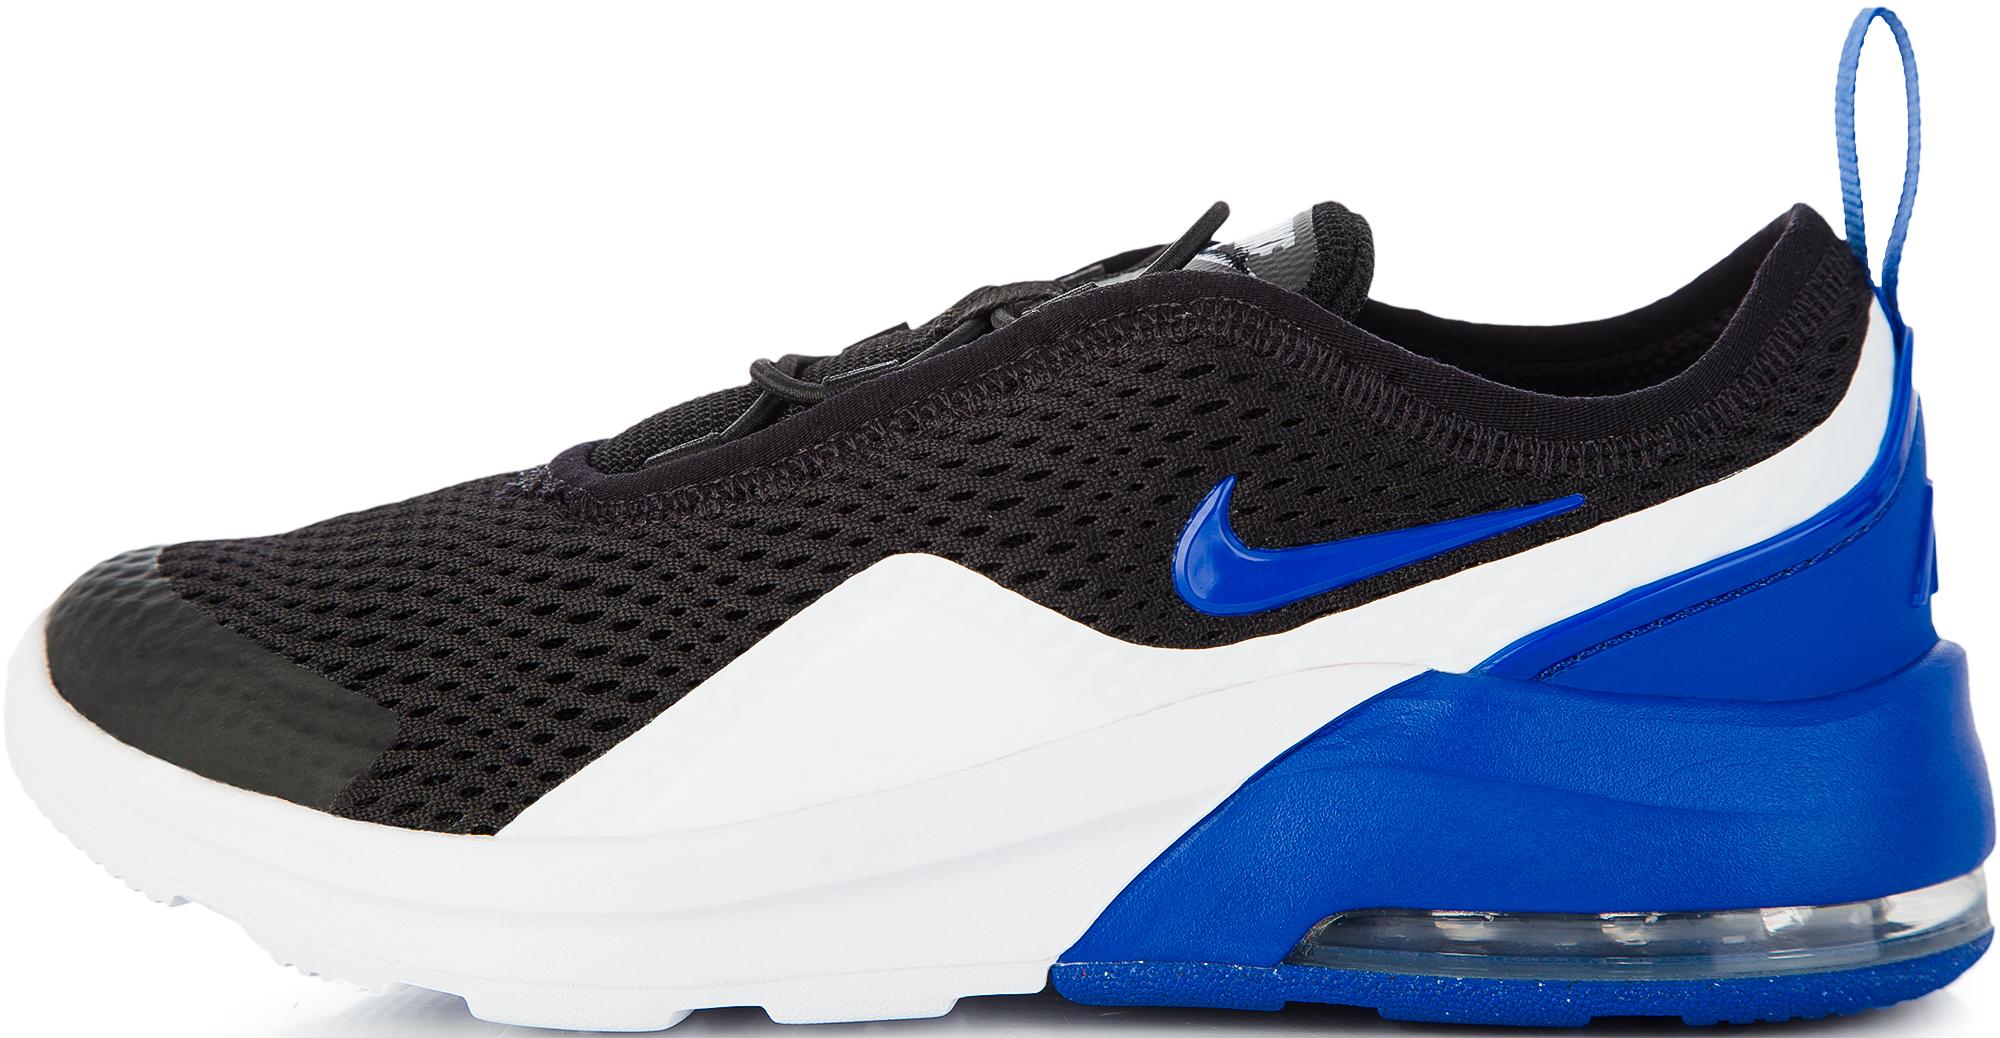 Nike Кроссовки для мальчиков Nike Air Max Motion 2, размер 33